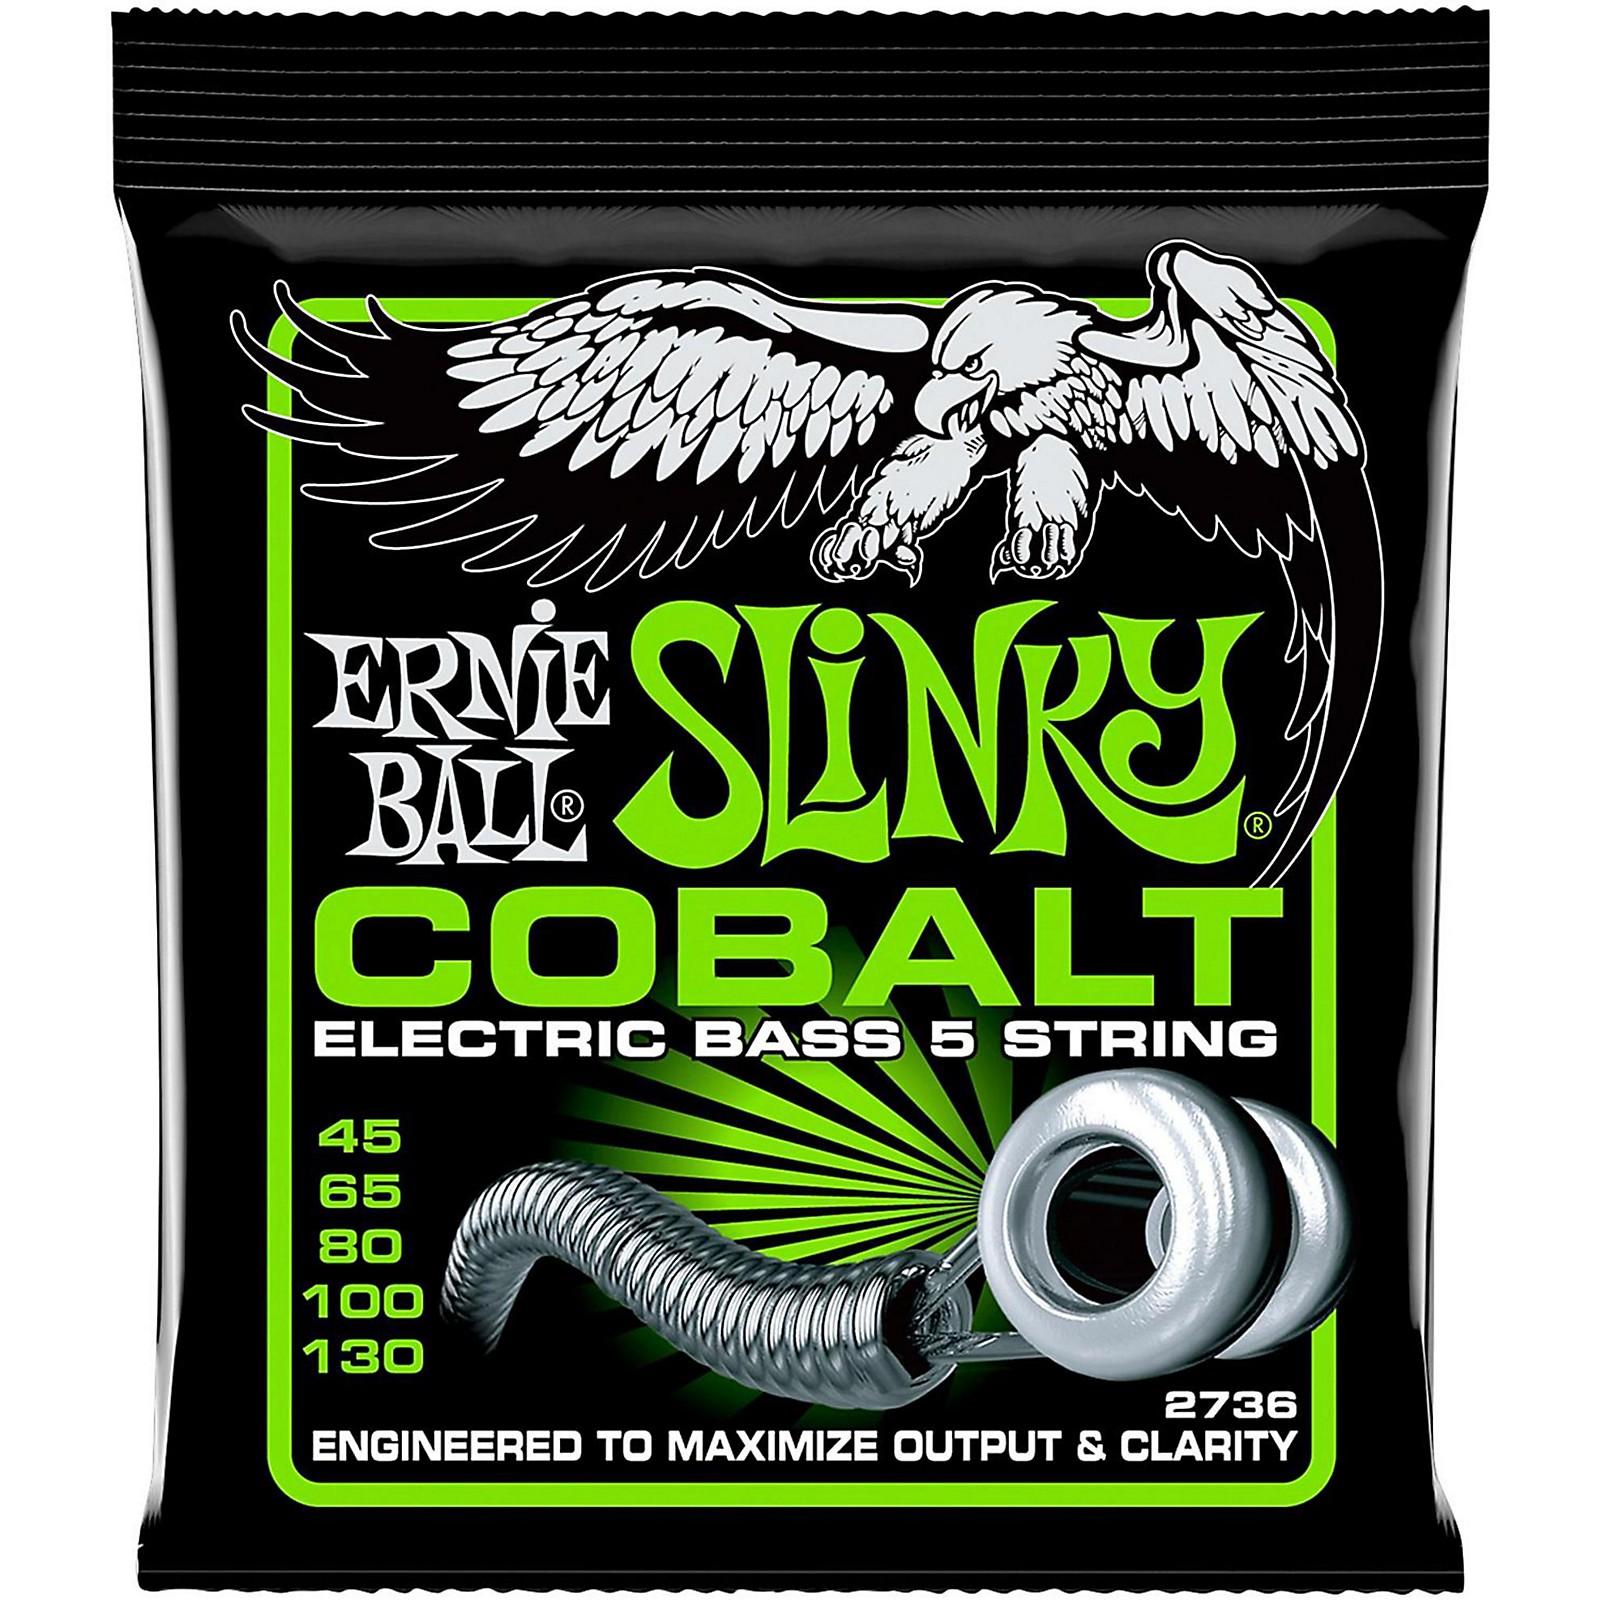 Ernie Ball 2736 Cobalt Regular Slinky 5-String Electric Bass Strings